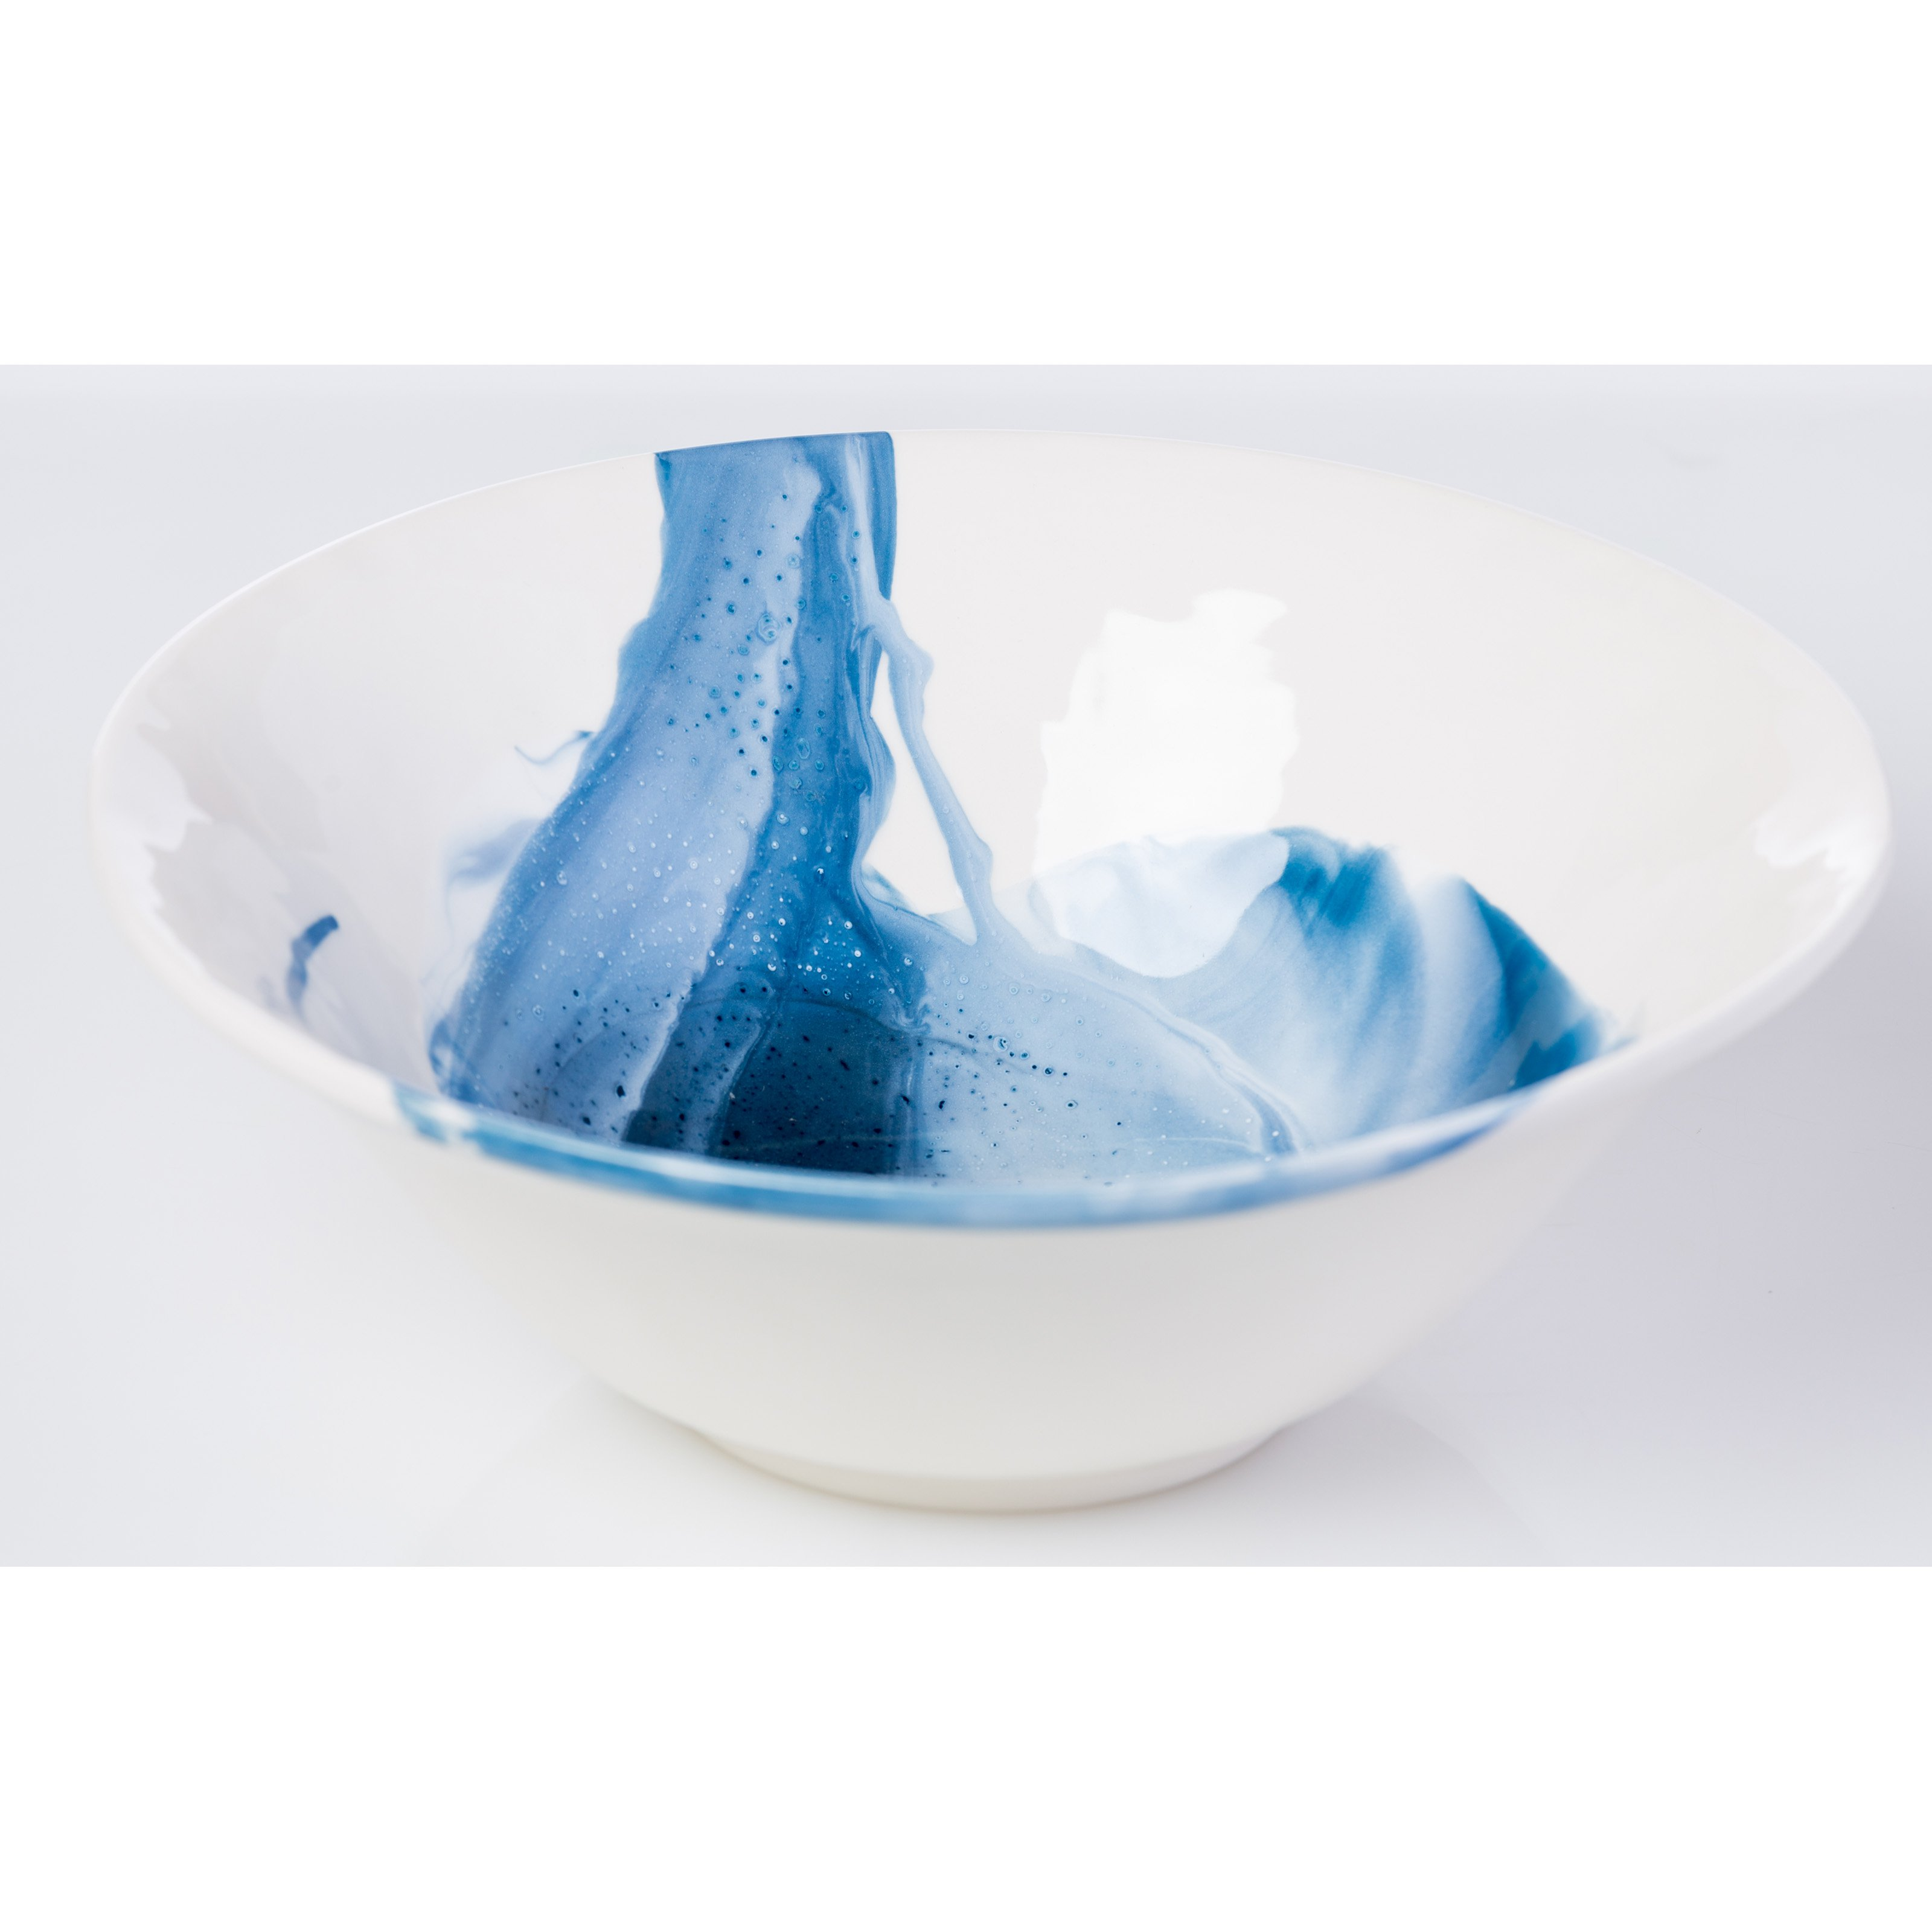 Abigails Splash Serving Bowl by